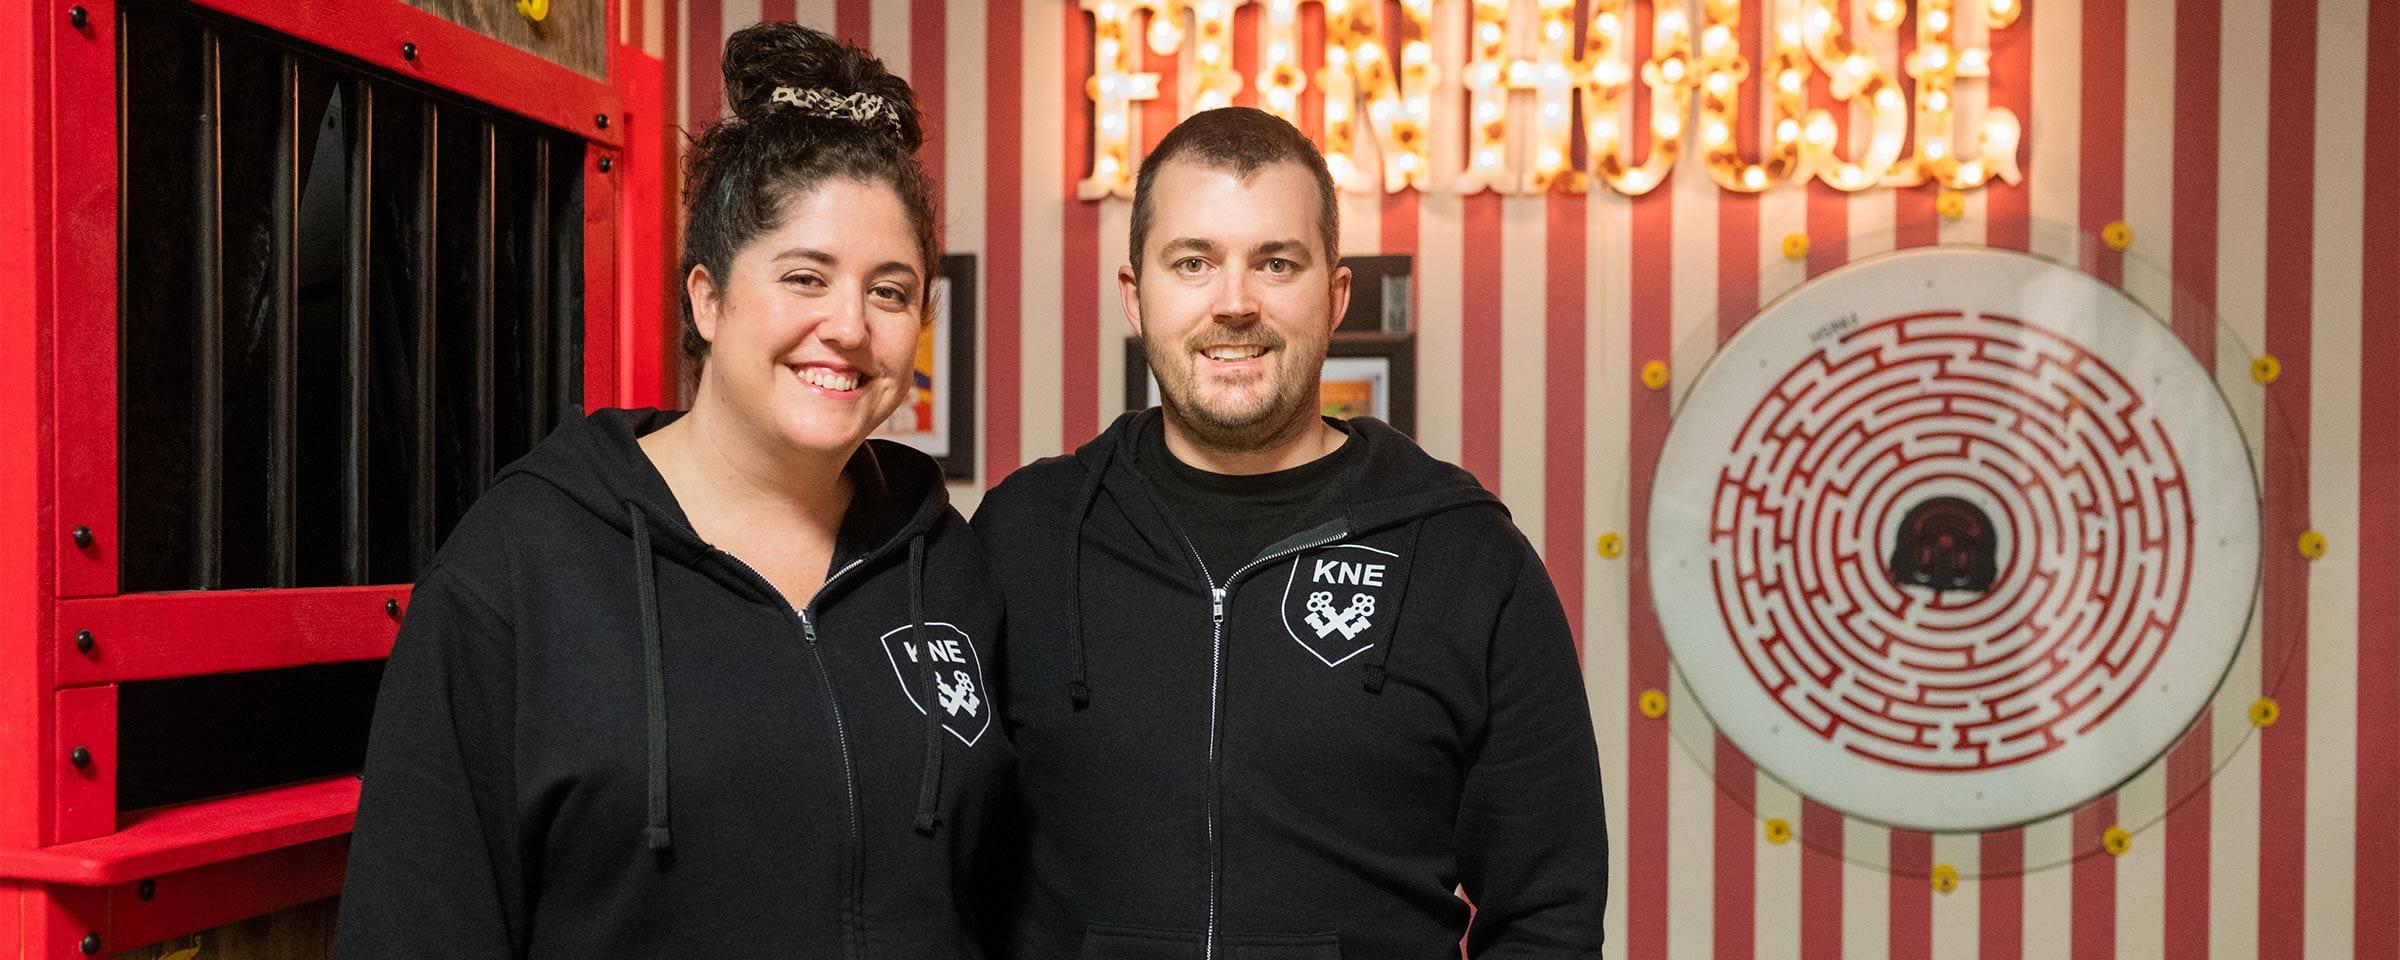 RRC grads Lisa Bernstein and Chris McMillan, Killer Noob Escapes